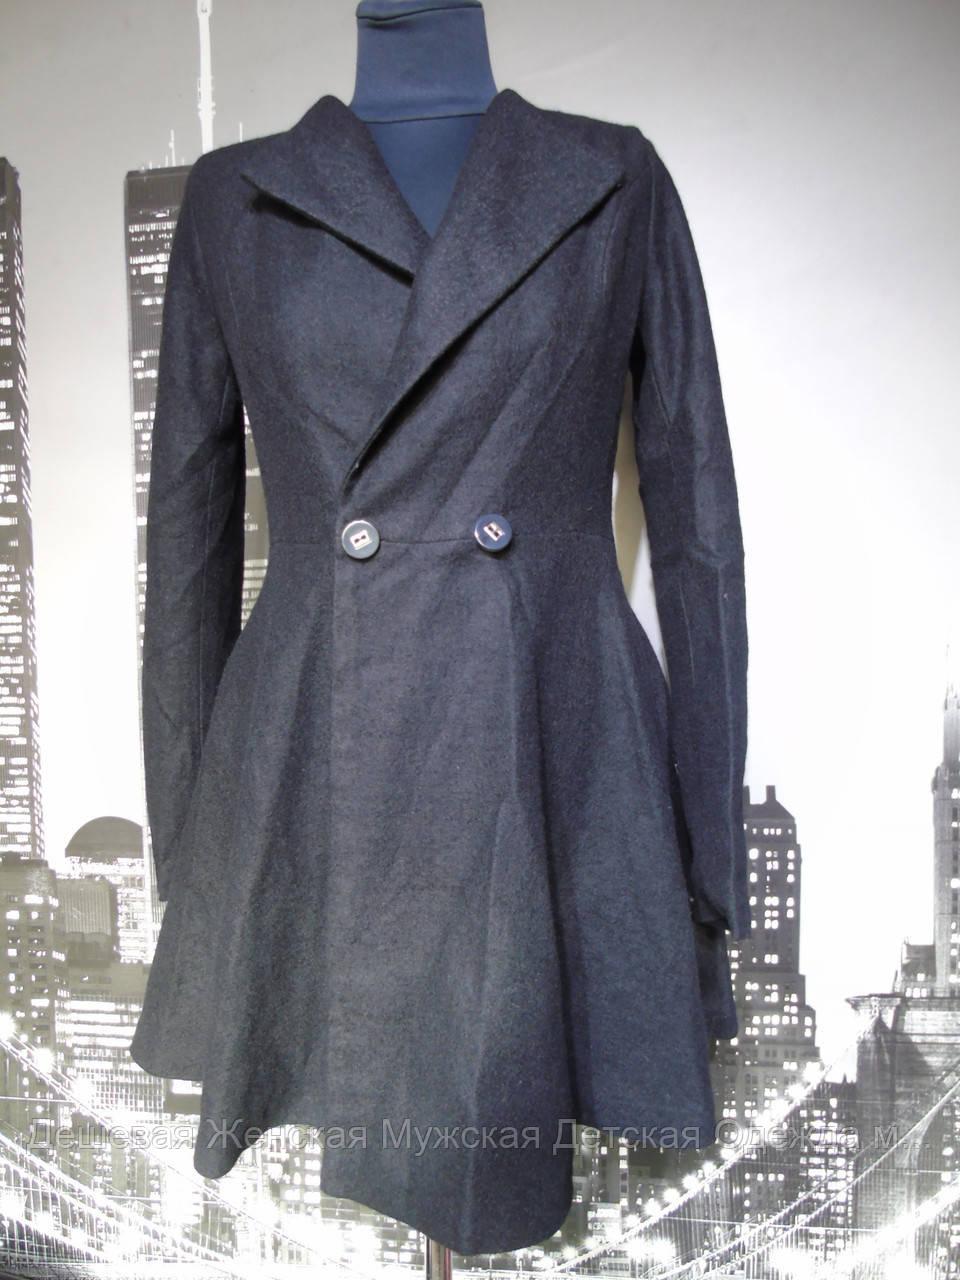 Пальто жіноче кашемір весна-осінь